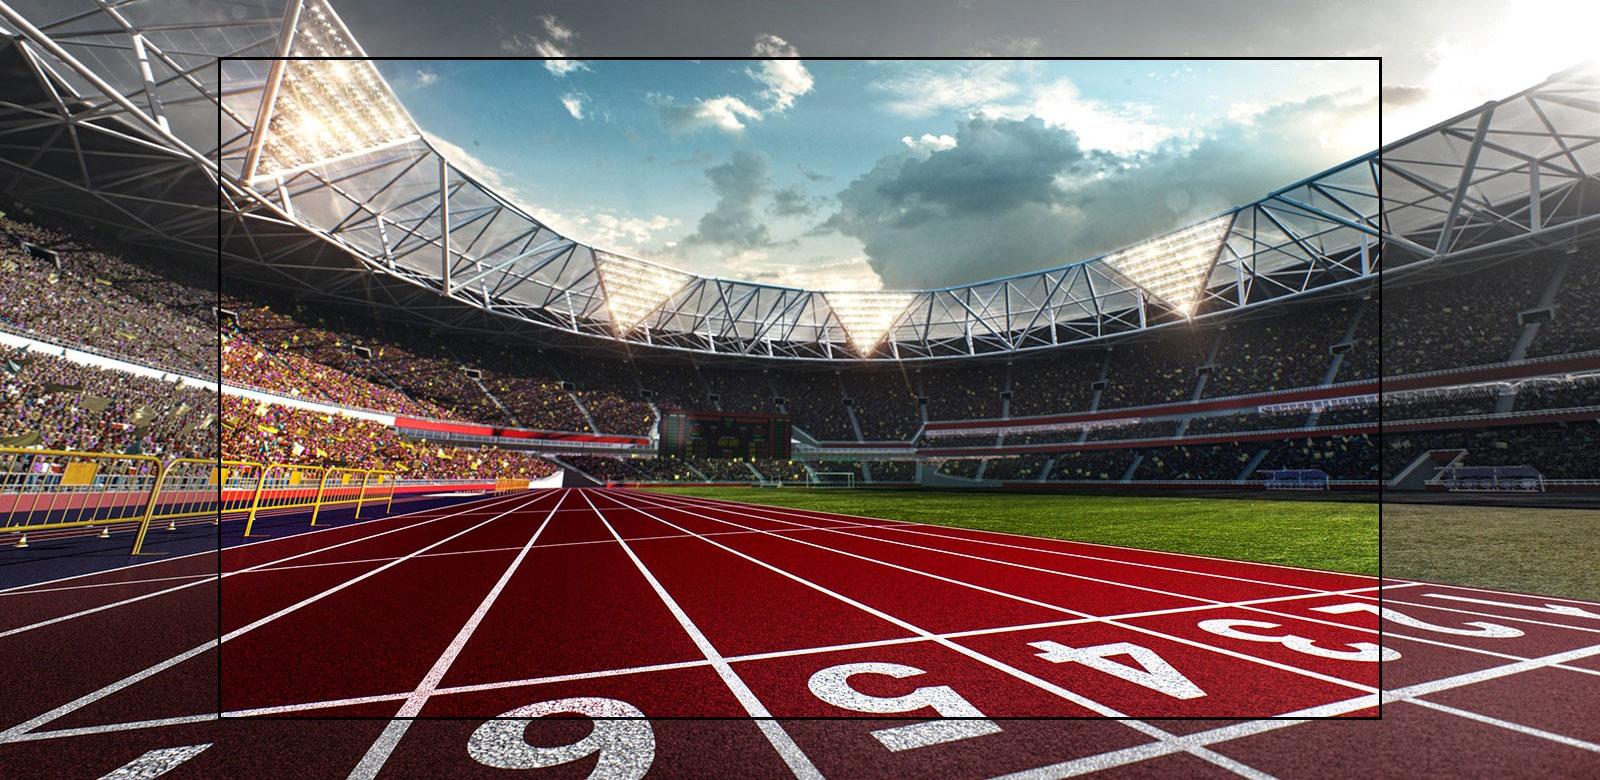 Feel the stadium atmosphere1